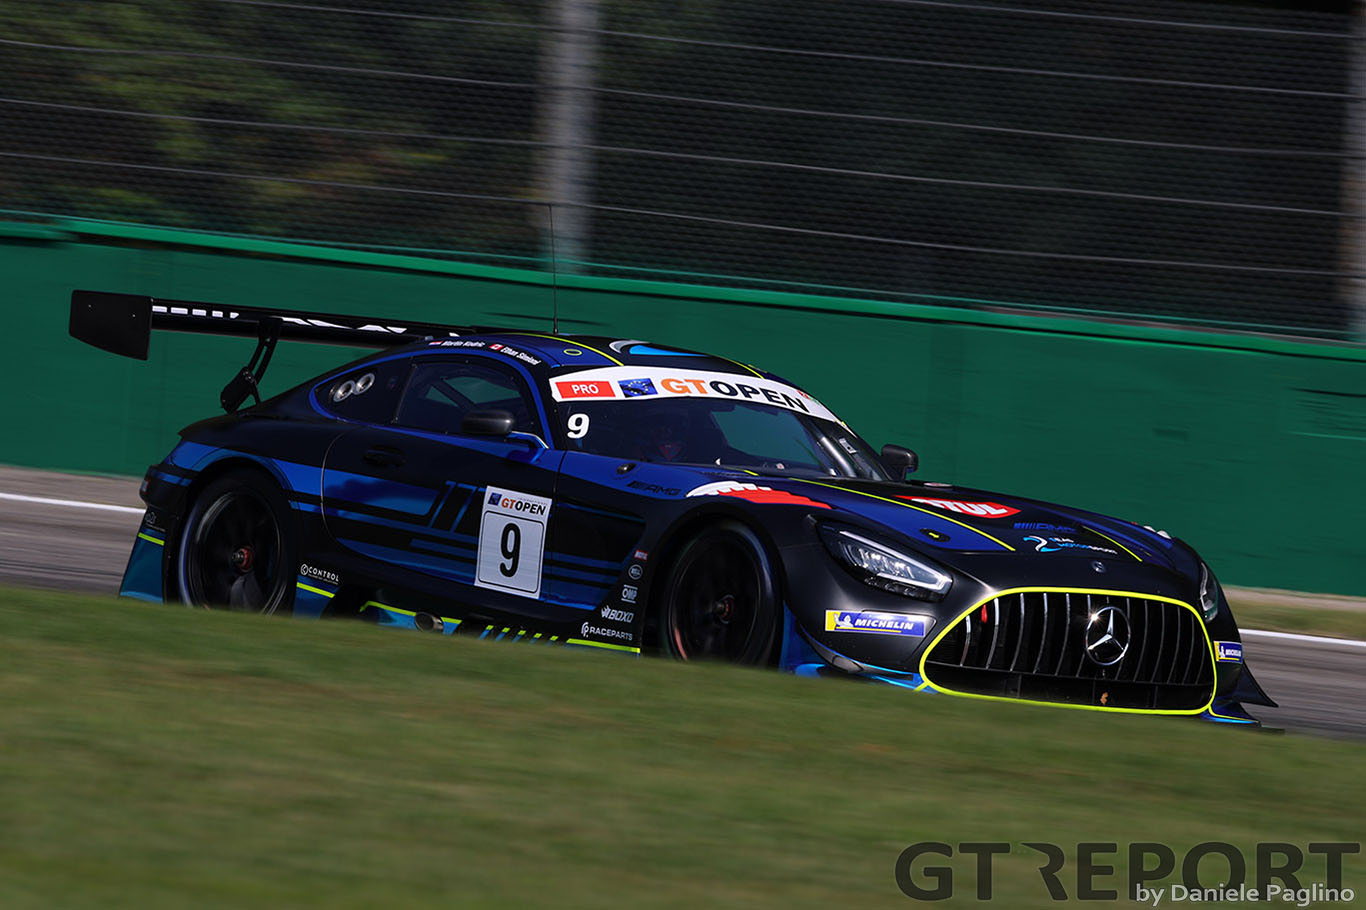 International GT Open Monza race 1 report: Kodrić and Simioni take debut win for 2 Seas